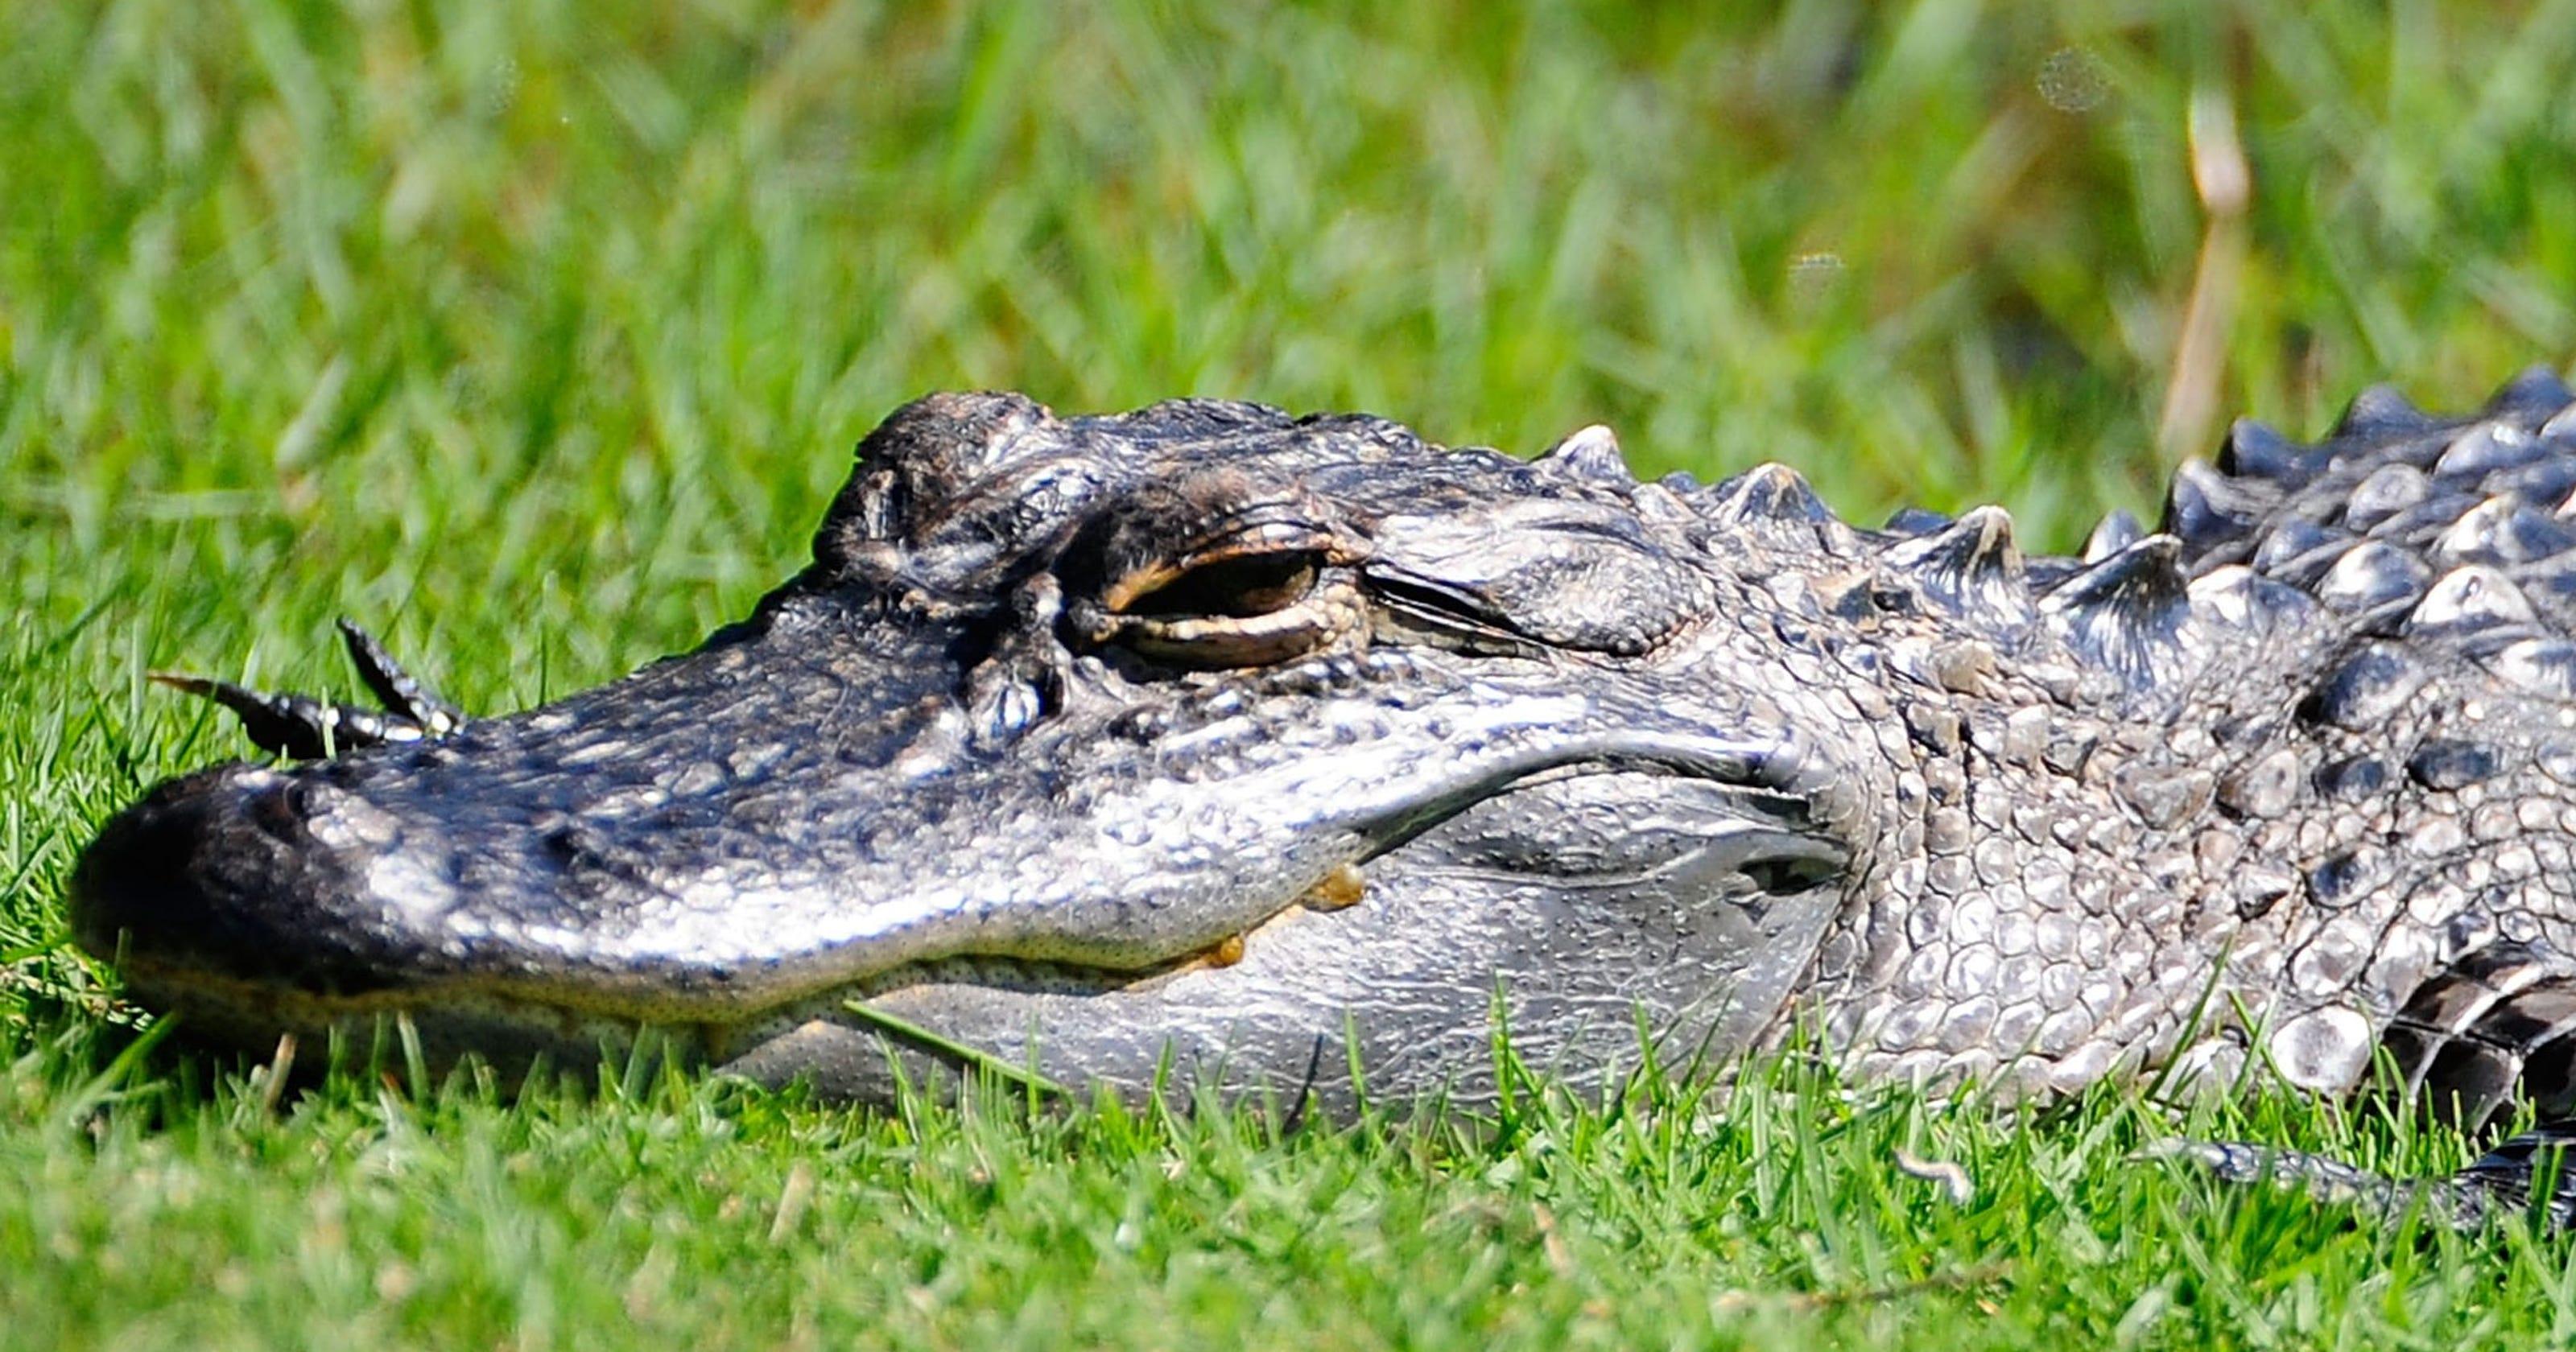 Florida deputy kills alligator who chased teen up tree